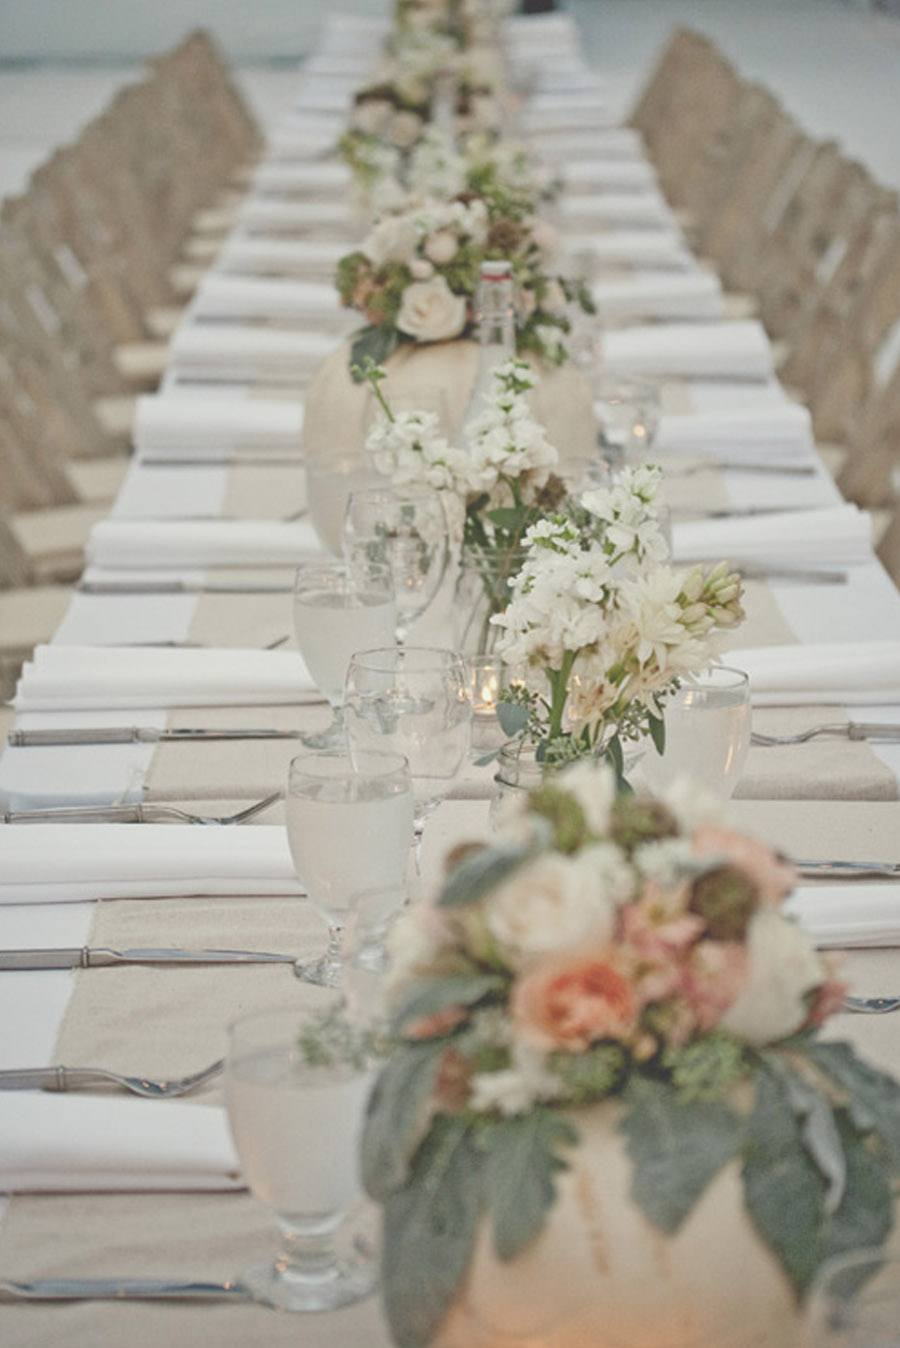 INSPIRACIÓN DECO: CALABAZAS boda-deco-calabaza